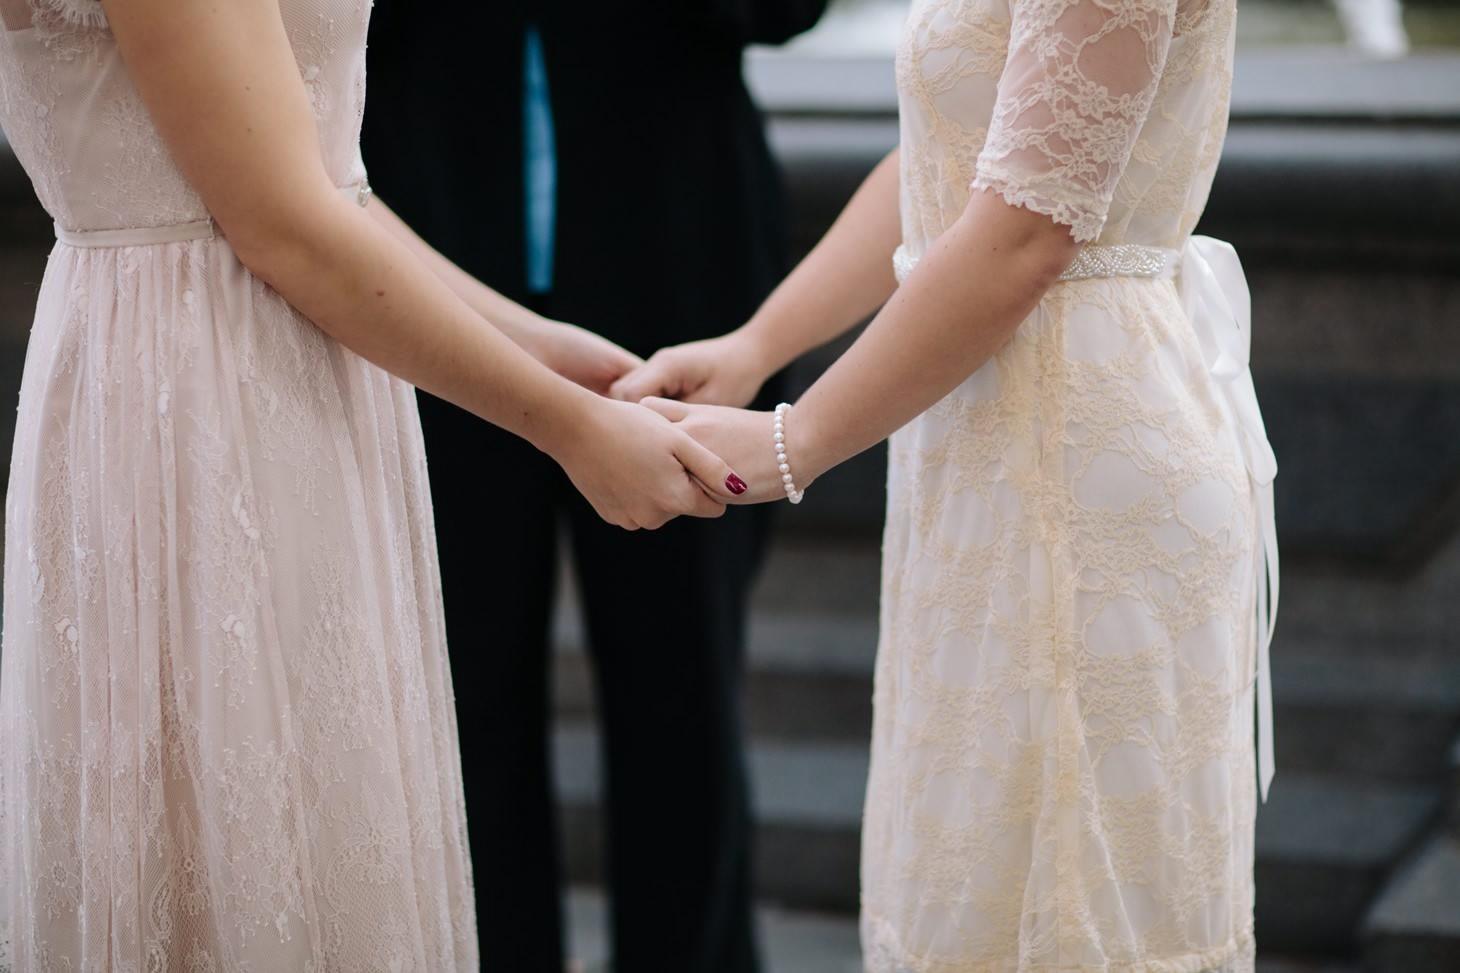 001-nyc-wedding-elopement-lgbt-friendly-photographer-city-hall-grand-central.jpg